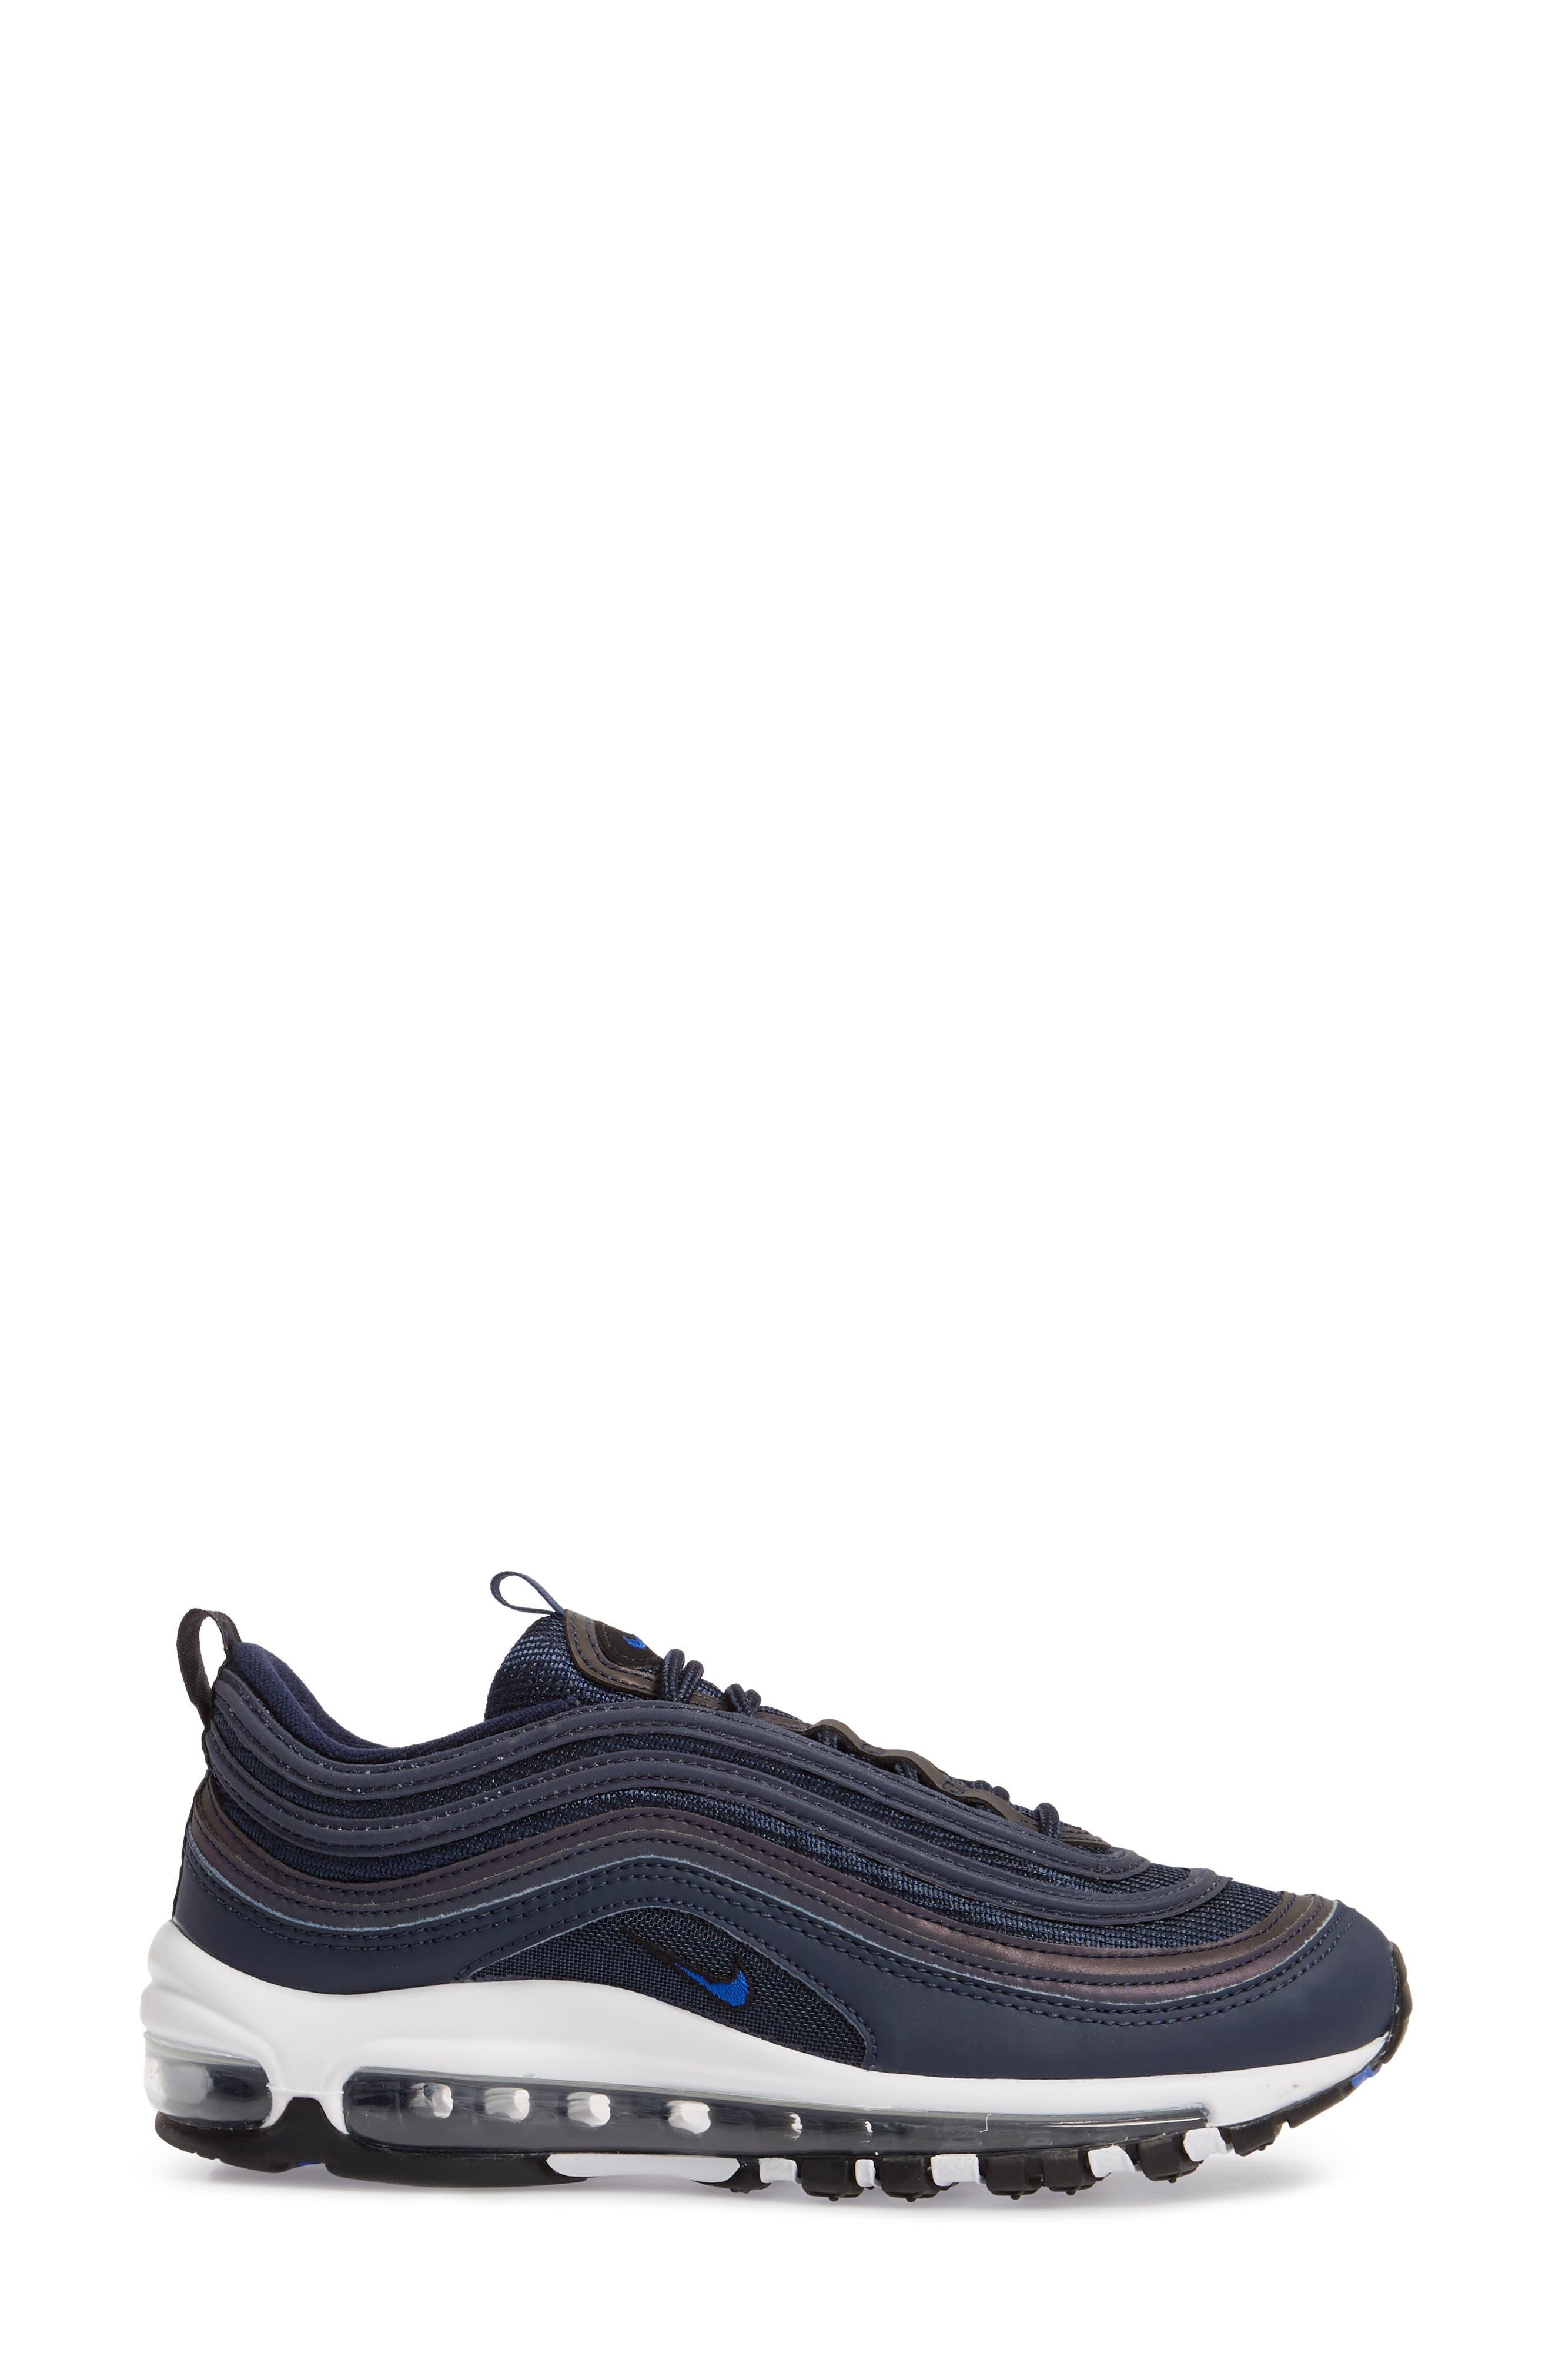 Air Max 97 Sneaker,                             Alternate thumbnail 3, color,                             OBSIDIAN/ WHITE/ BLACK